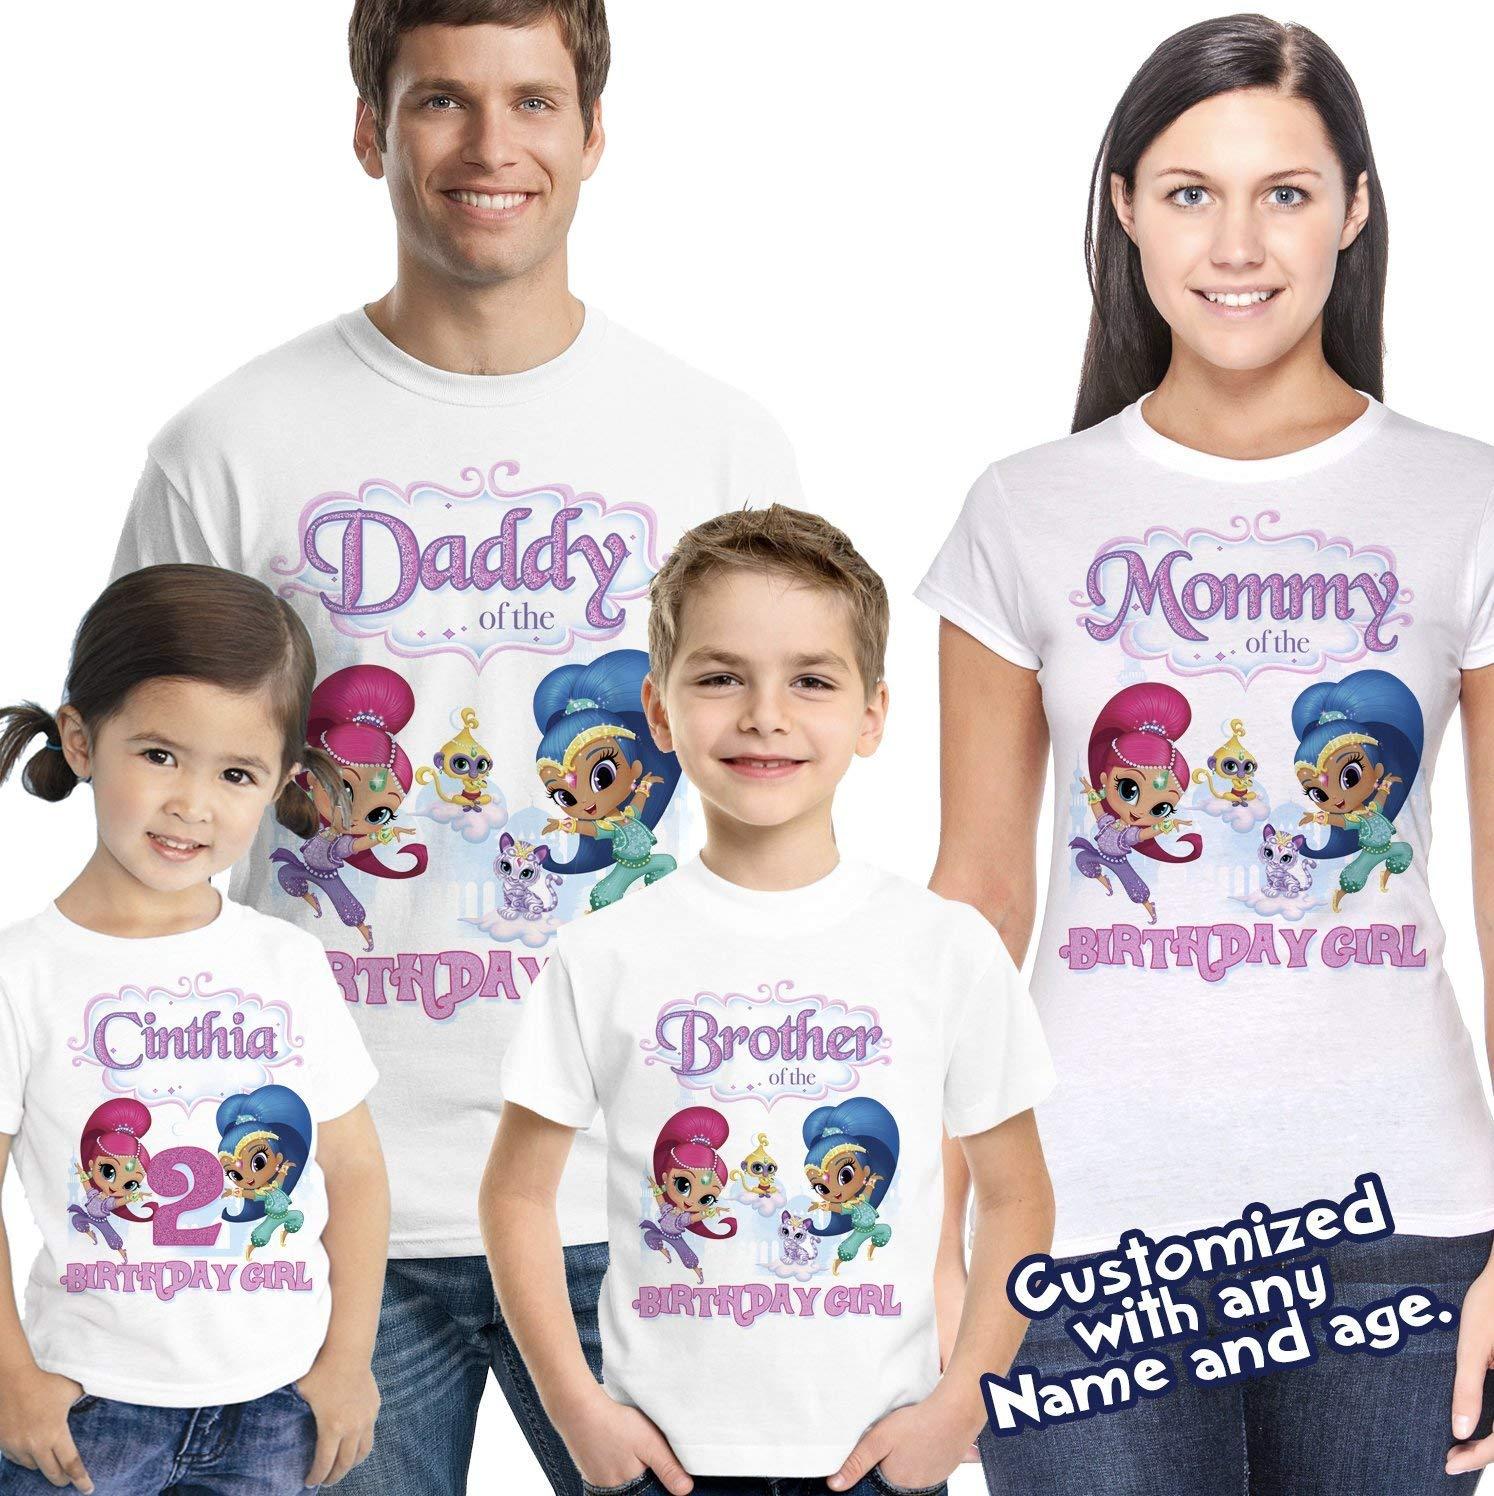 Shimmer and shine shirt, shimmer and shine shirt, family matching shirts, shimmer and shine birthday party shirt, shimmer and shine party